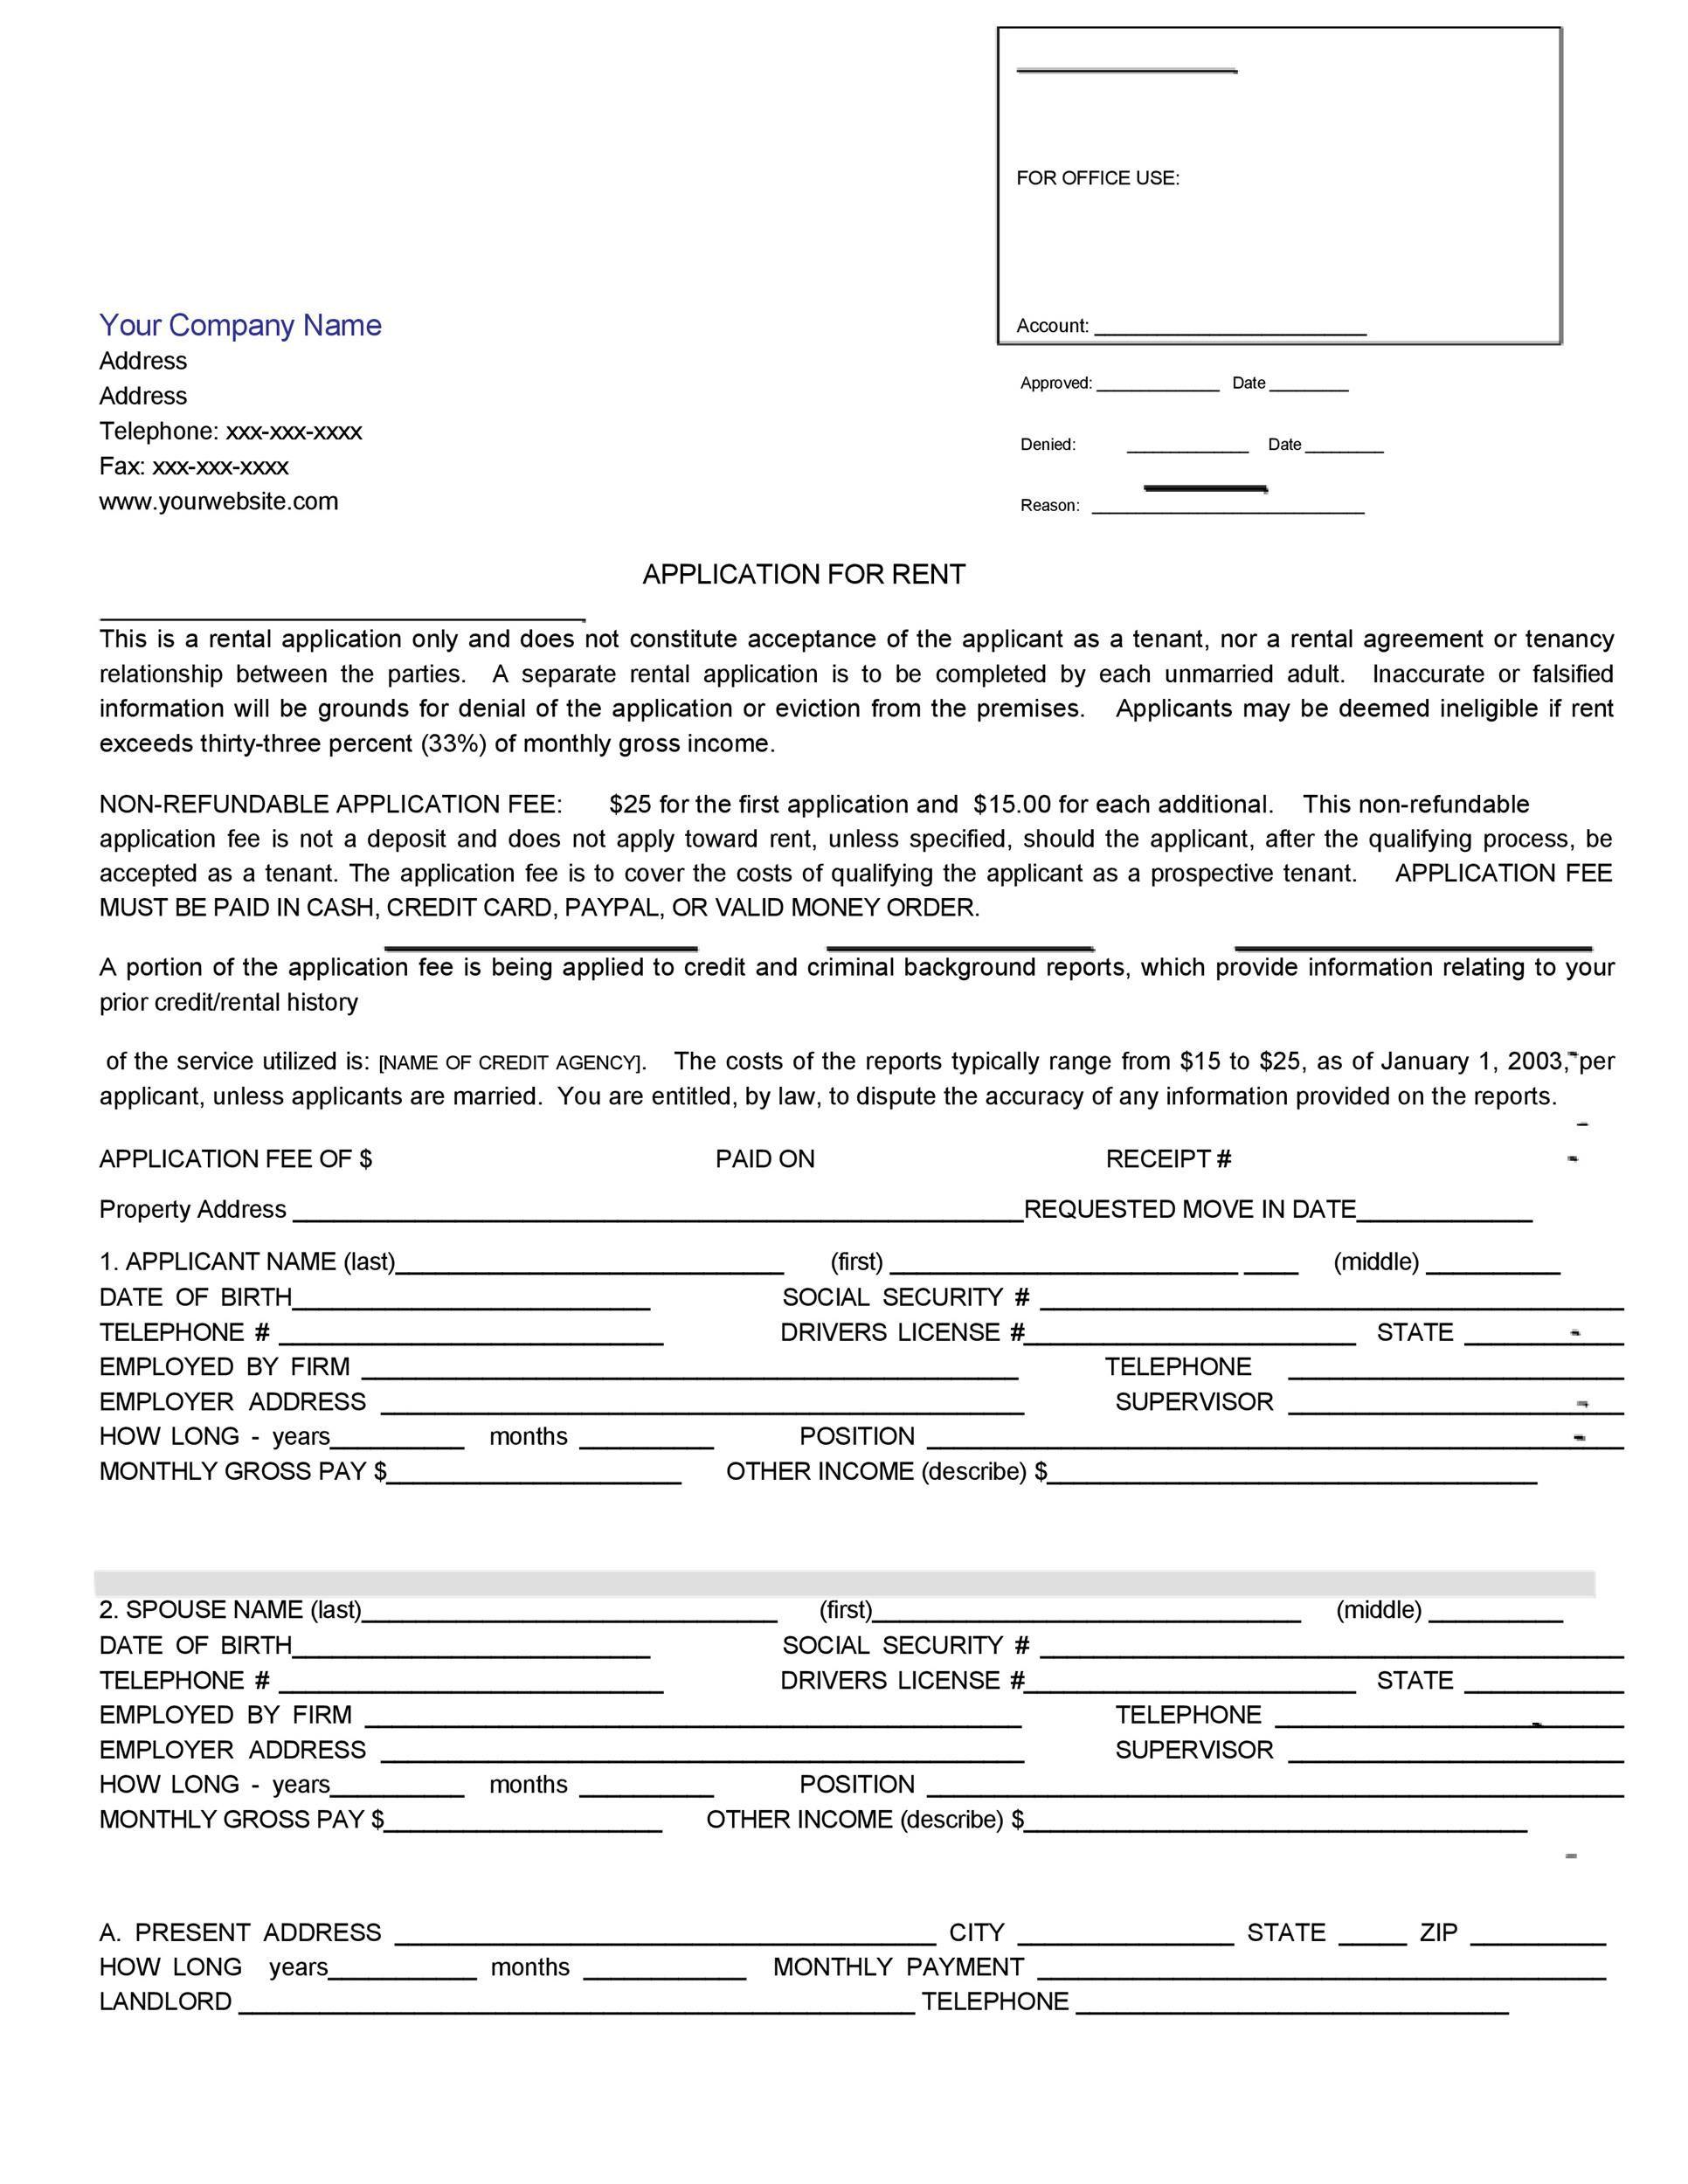 004 Surprising Free Rental Application Template Design  Form Oregon Credit OnlineFull